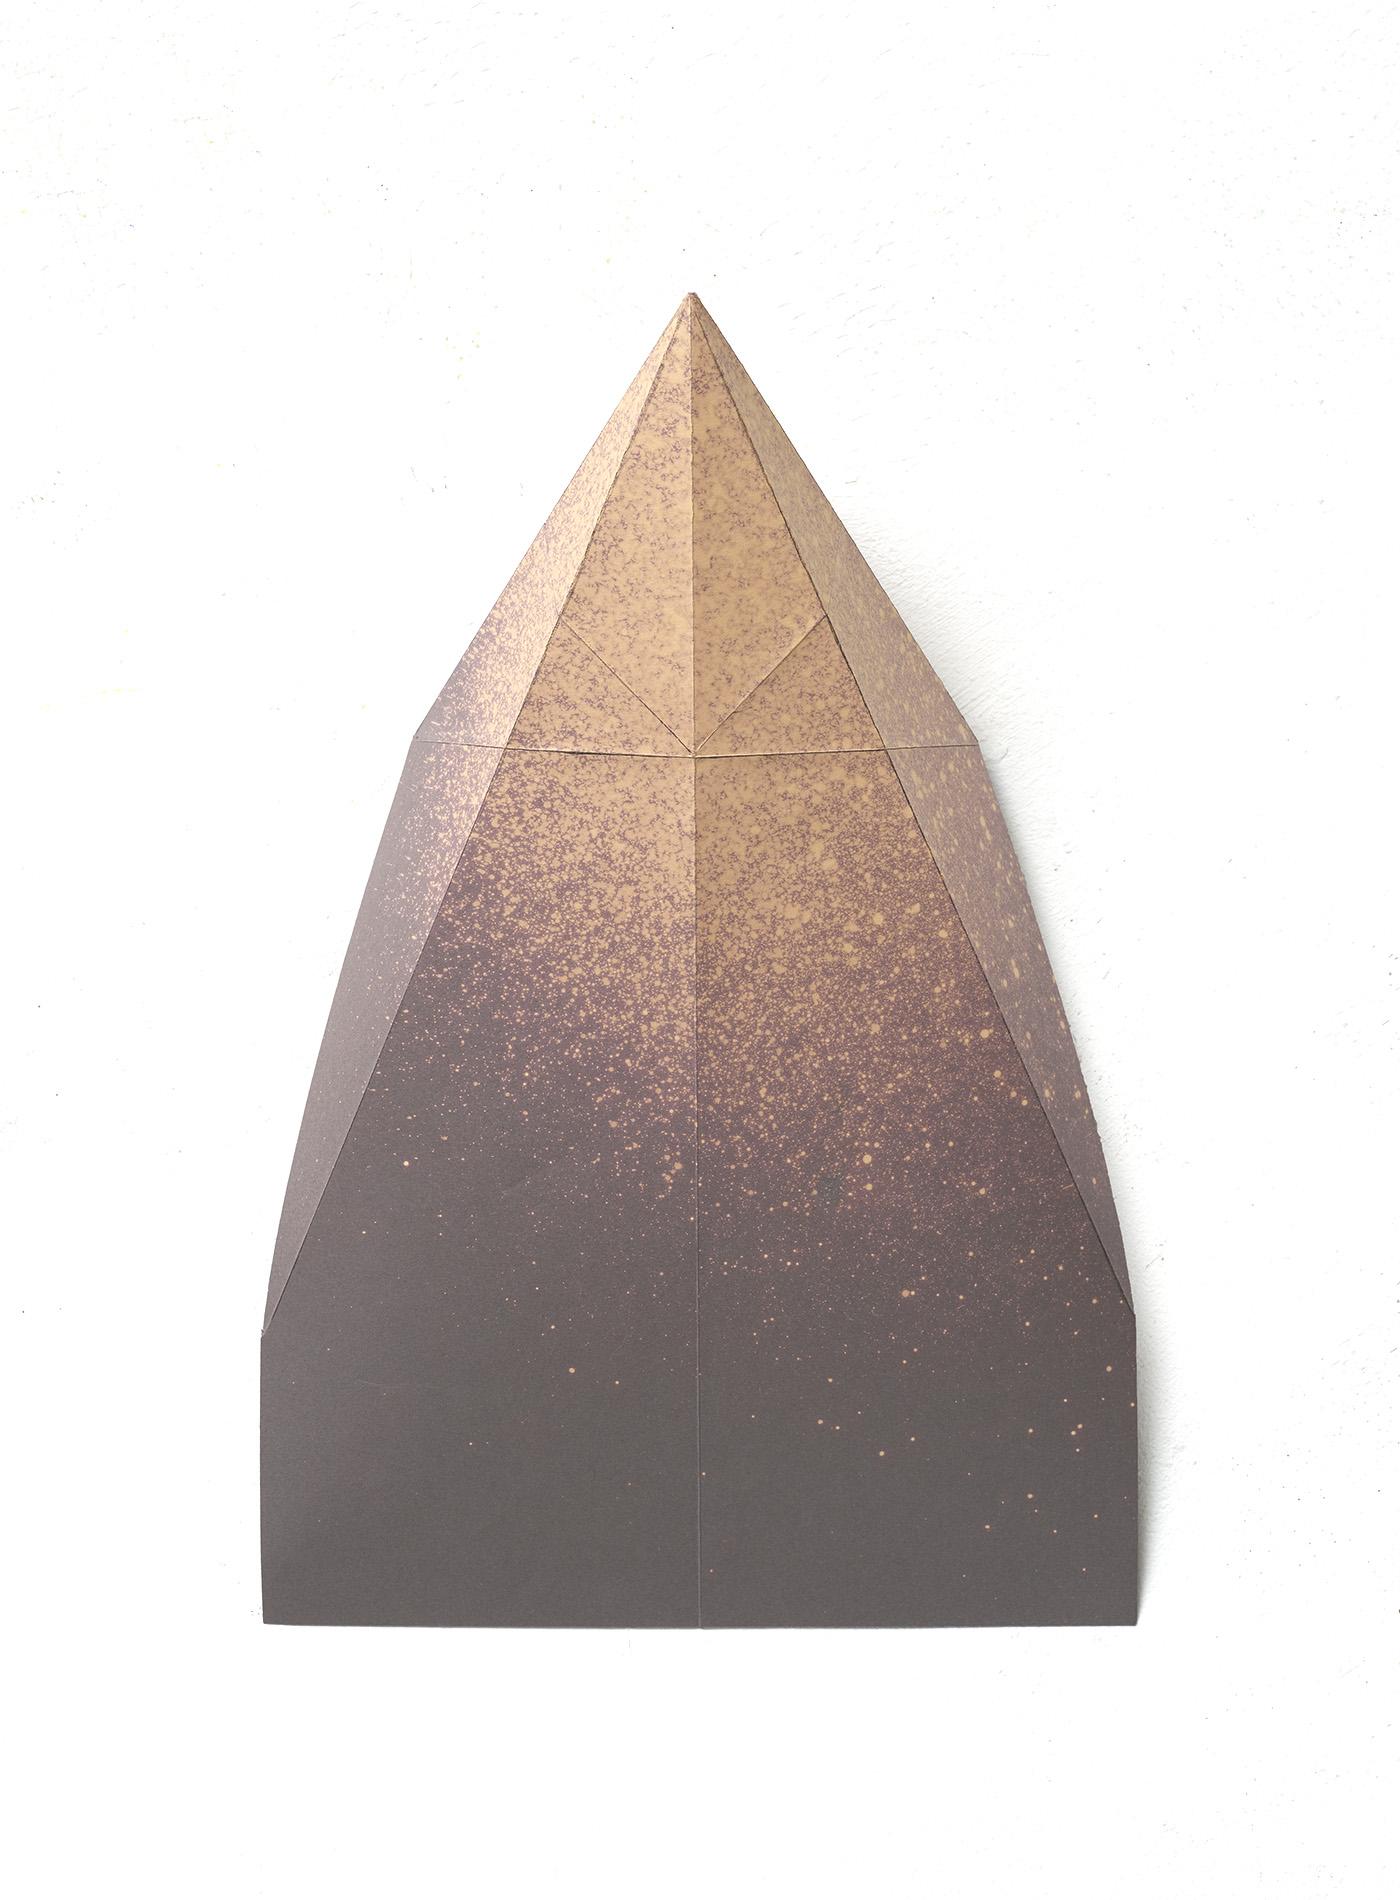 Origami-Volator-Angelika-J-Trojnarski-a